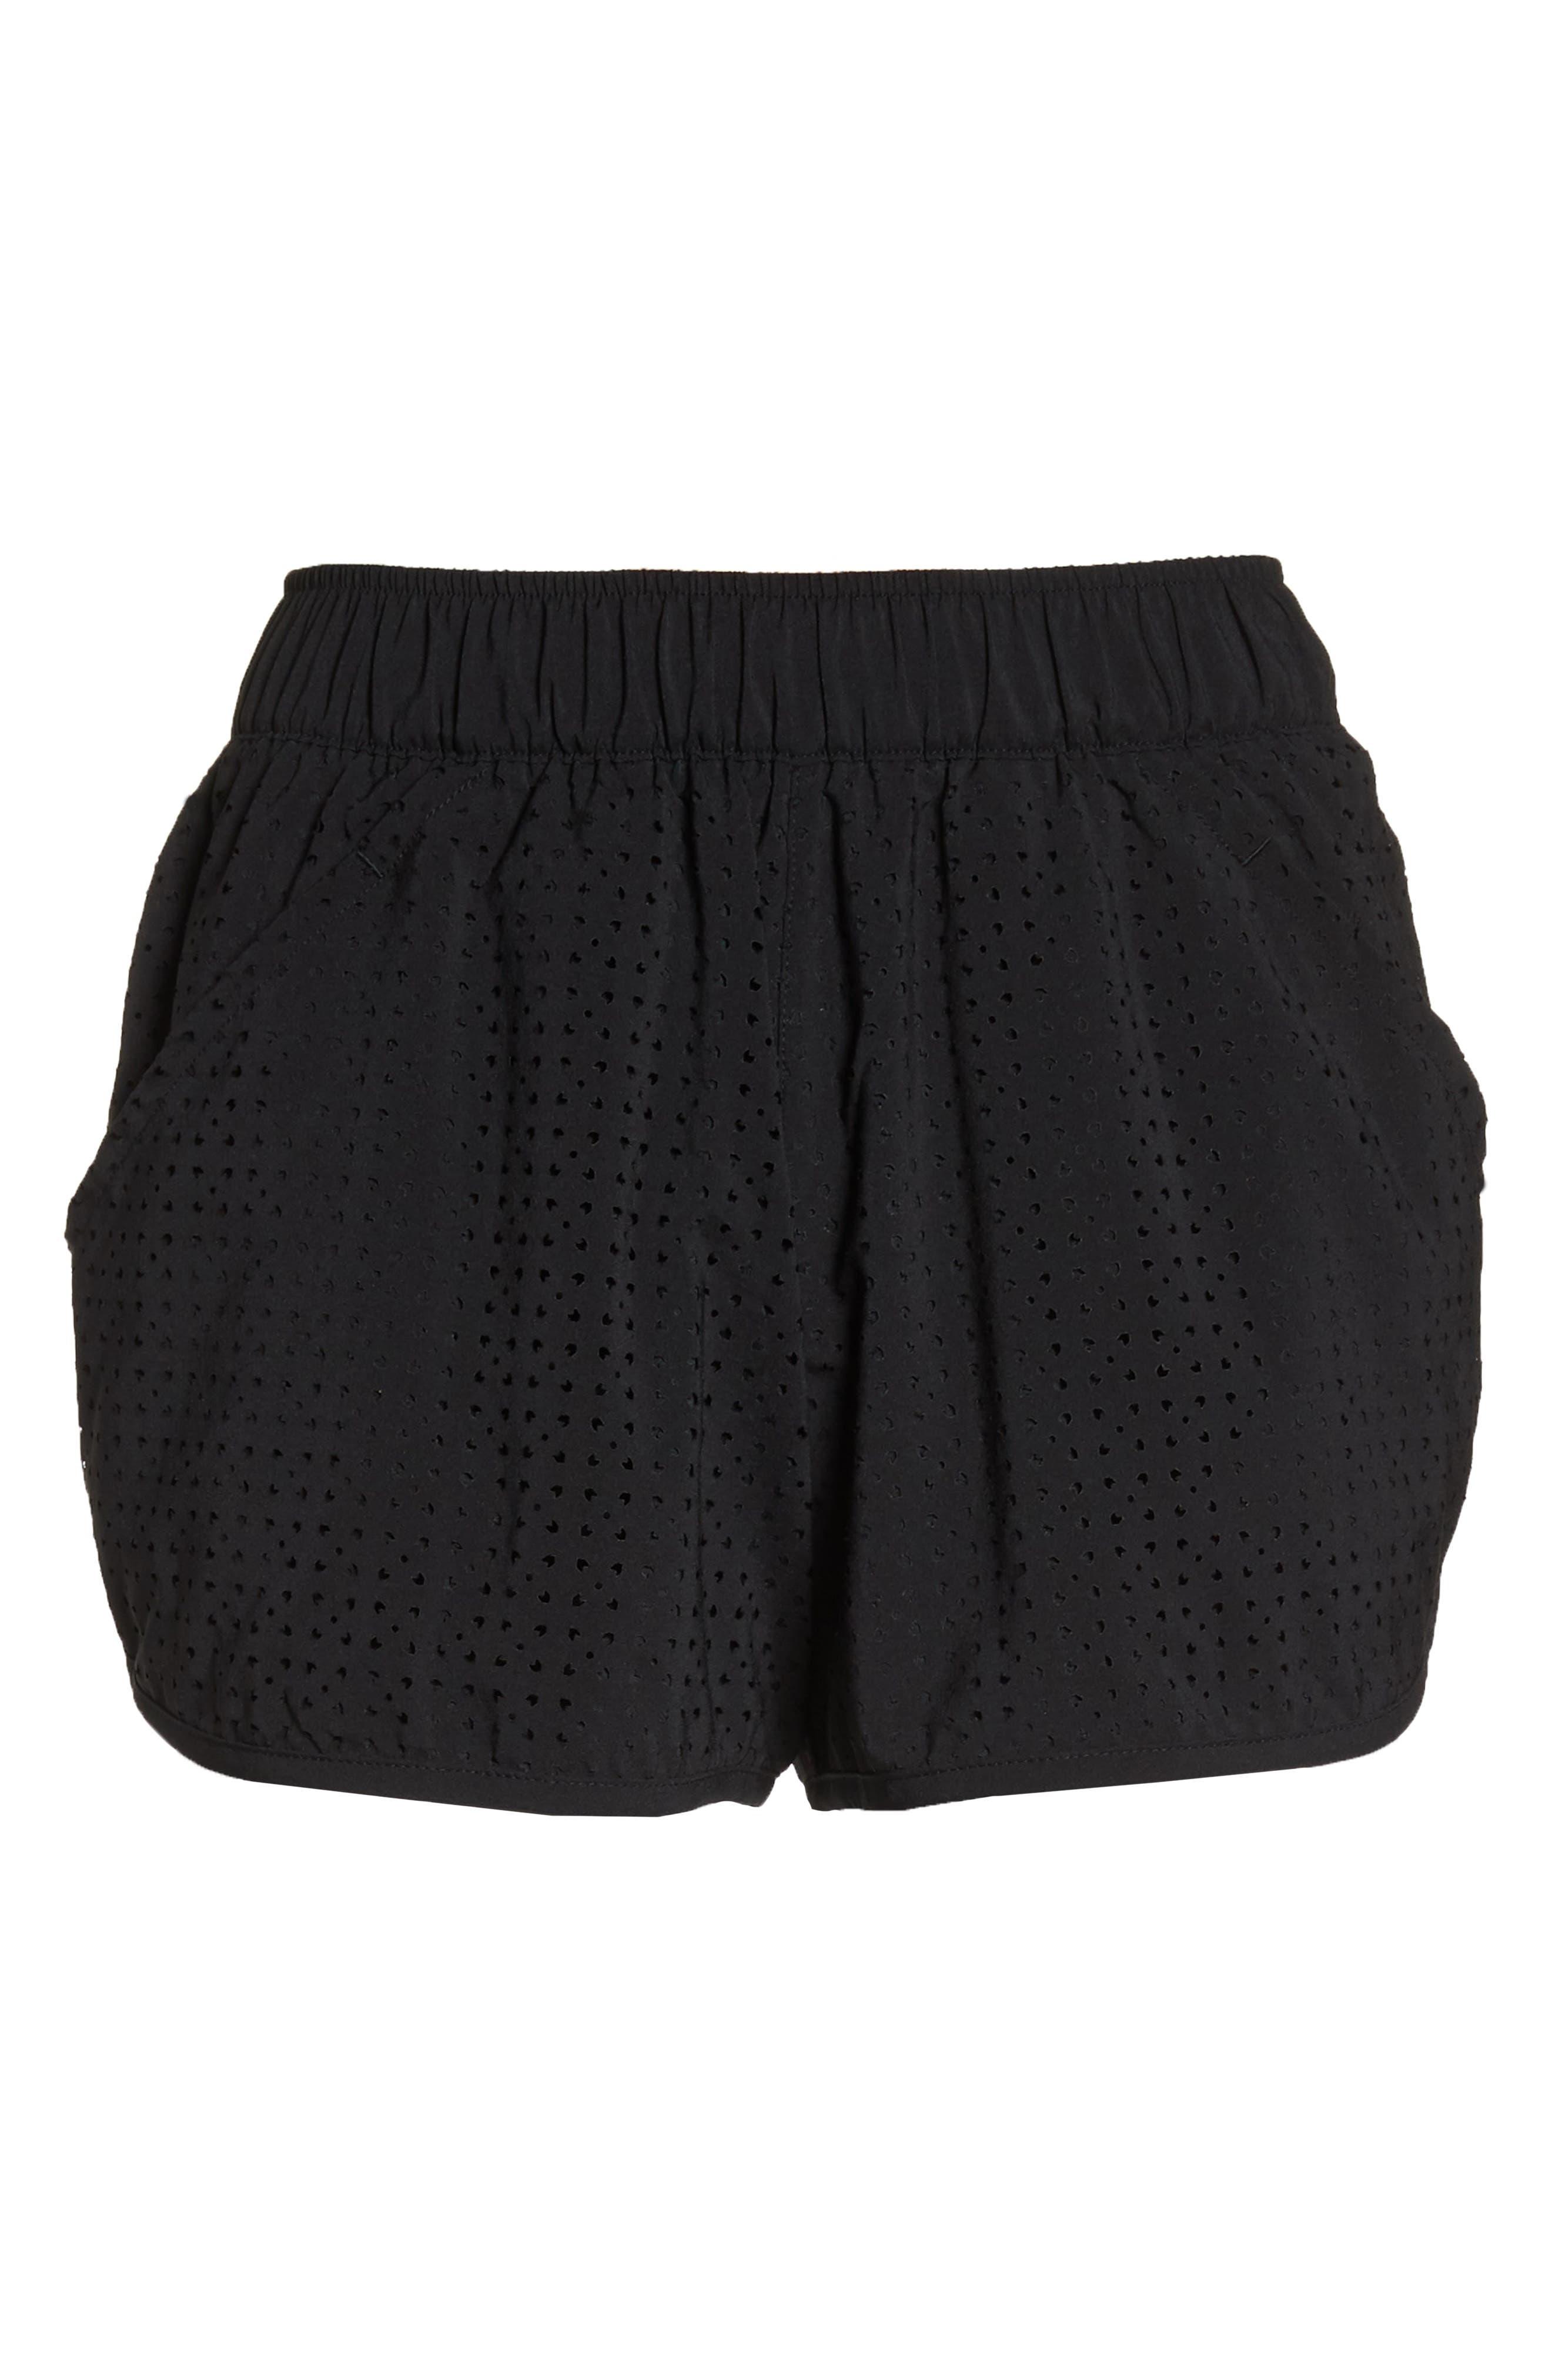 Punch Training Shorts,                             Alternate thumbnail 7, color,                             Puma Black